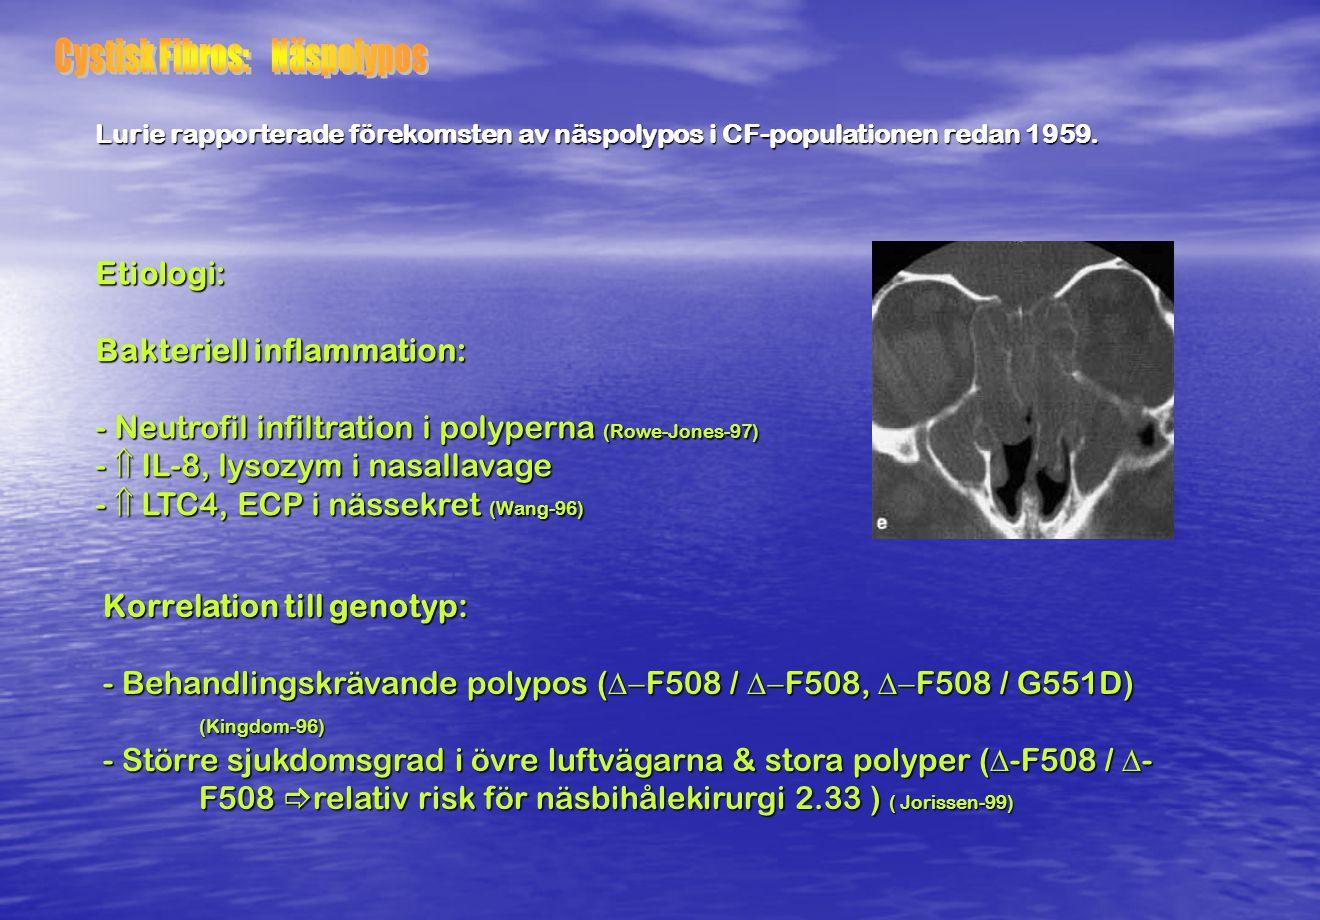 Etiologi: Bakteriell inflammation: - Neutrofil infiltration i polyperna (Rowe-Jones-97) -  IL-8, lysozym i nasallavage -  LTC4, ECP i nässekret (Wan